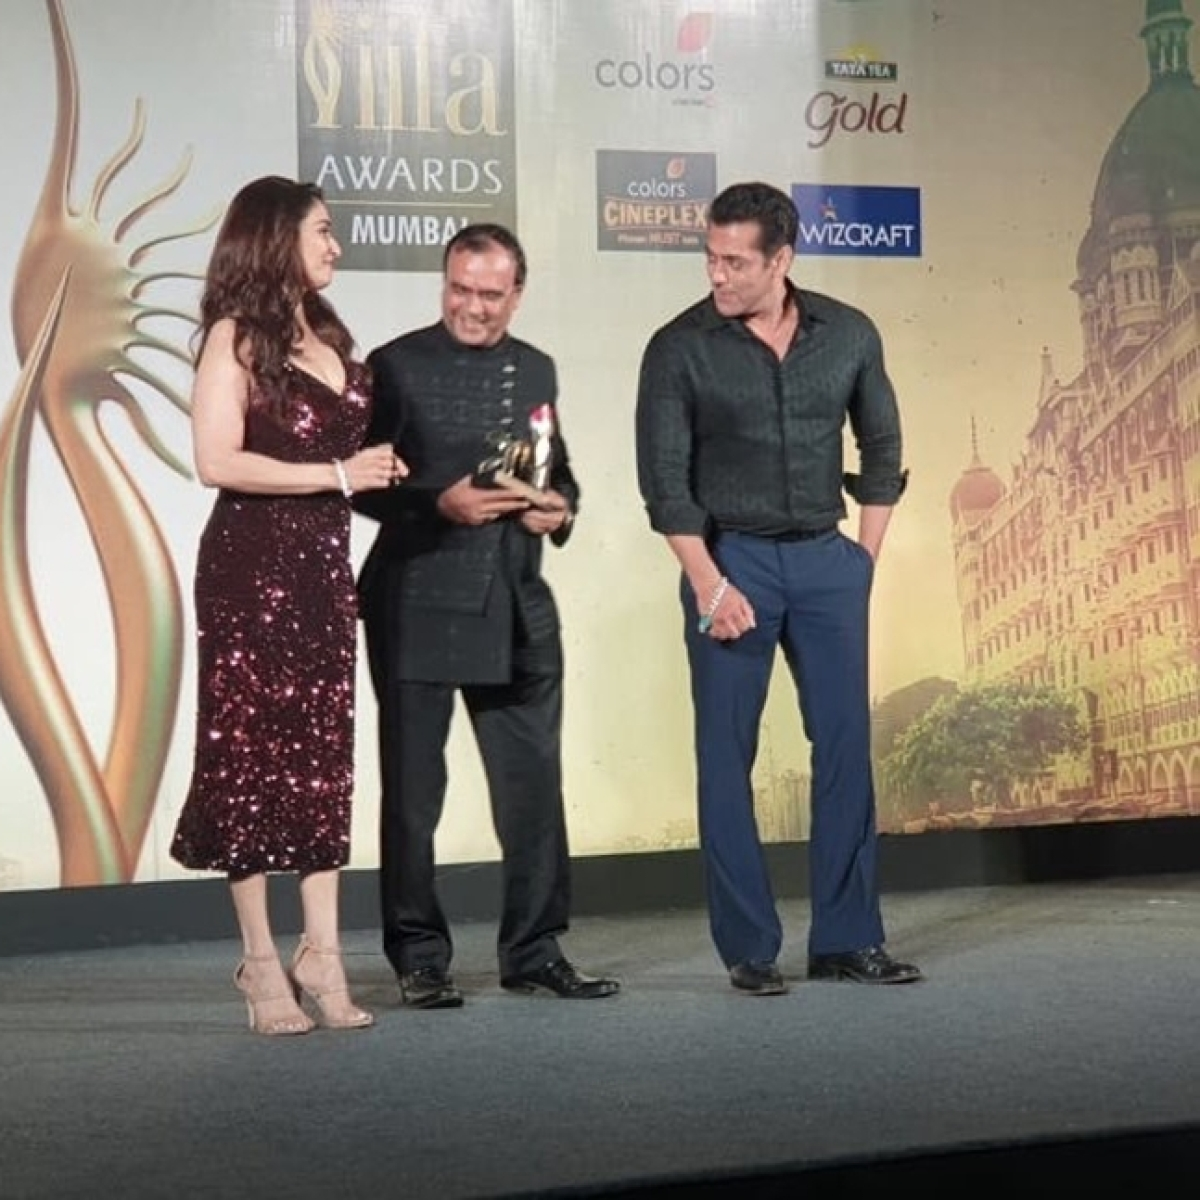 Don't use plastic, don't be plastic: Salman Khan urges fans to quit use of plastic